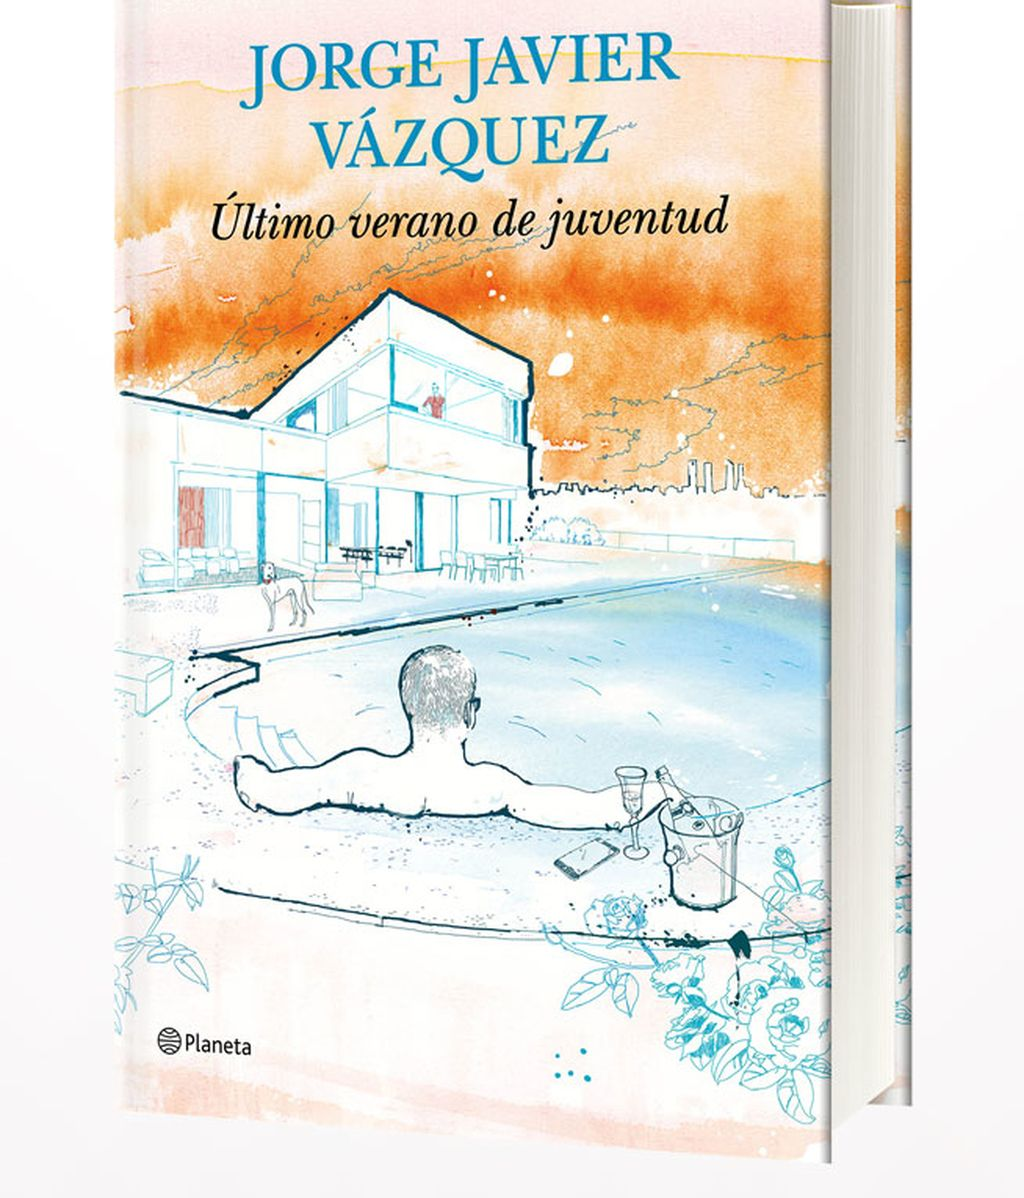 Jorge Javier Vázquez publica su segunda novela 'Último verano de juventud'